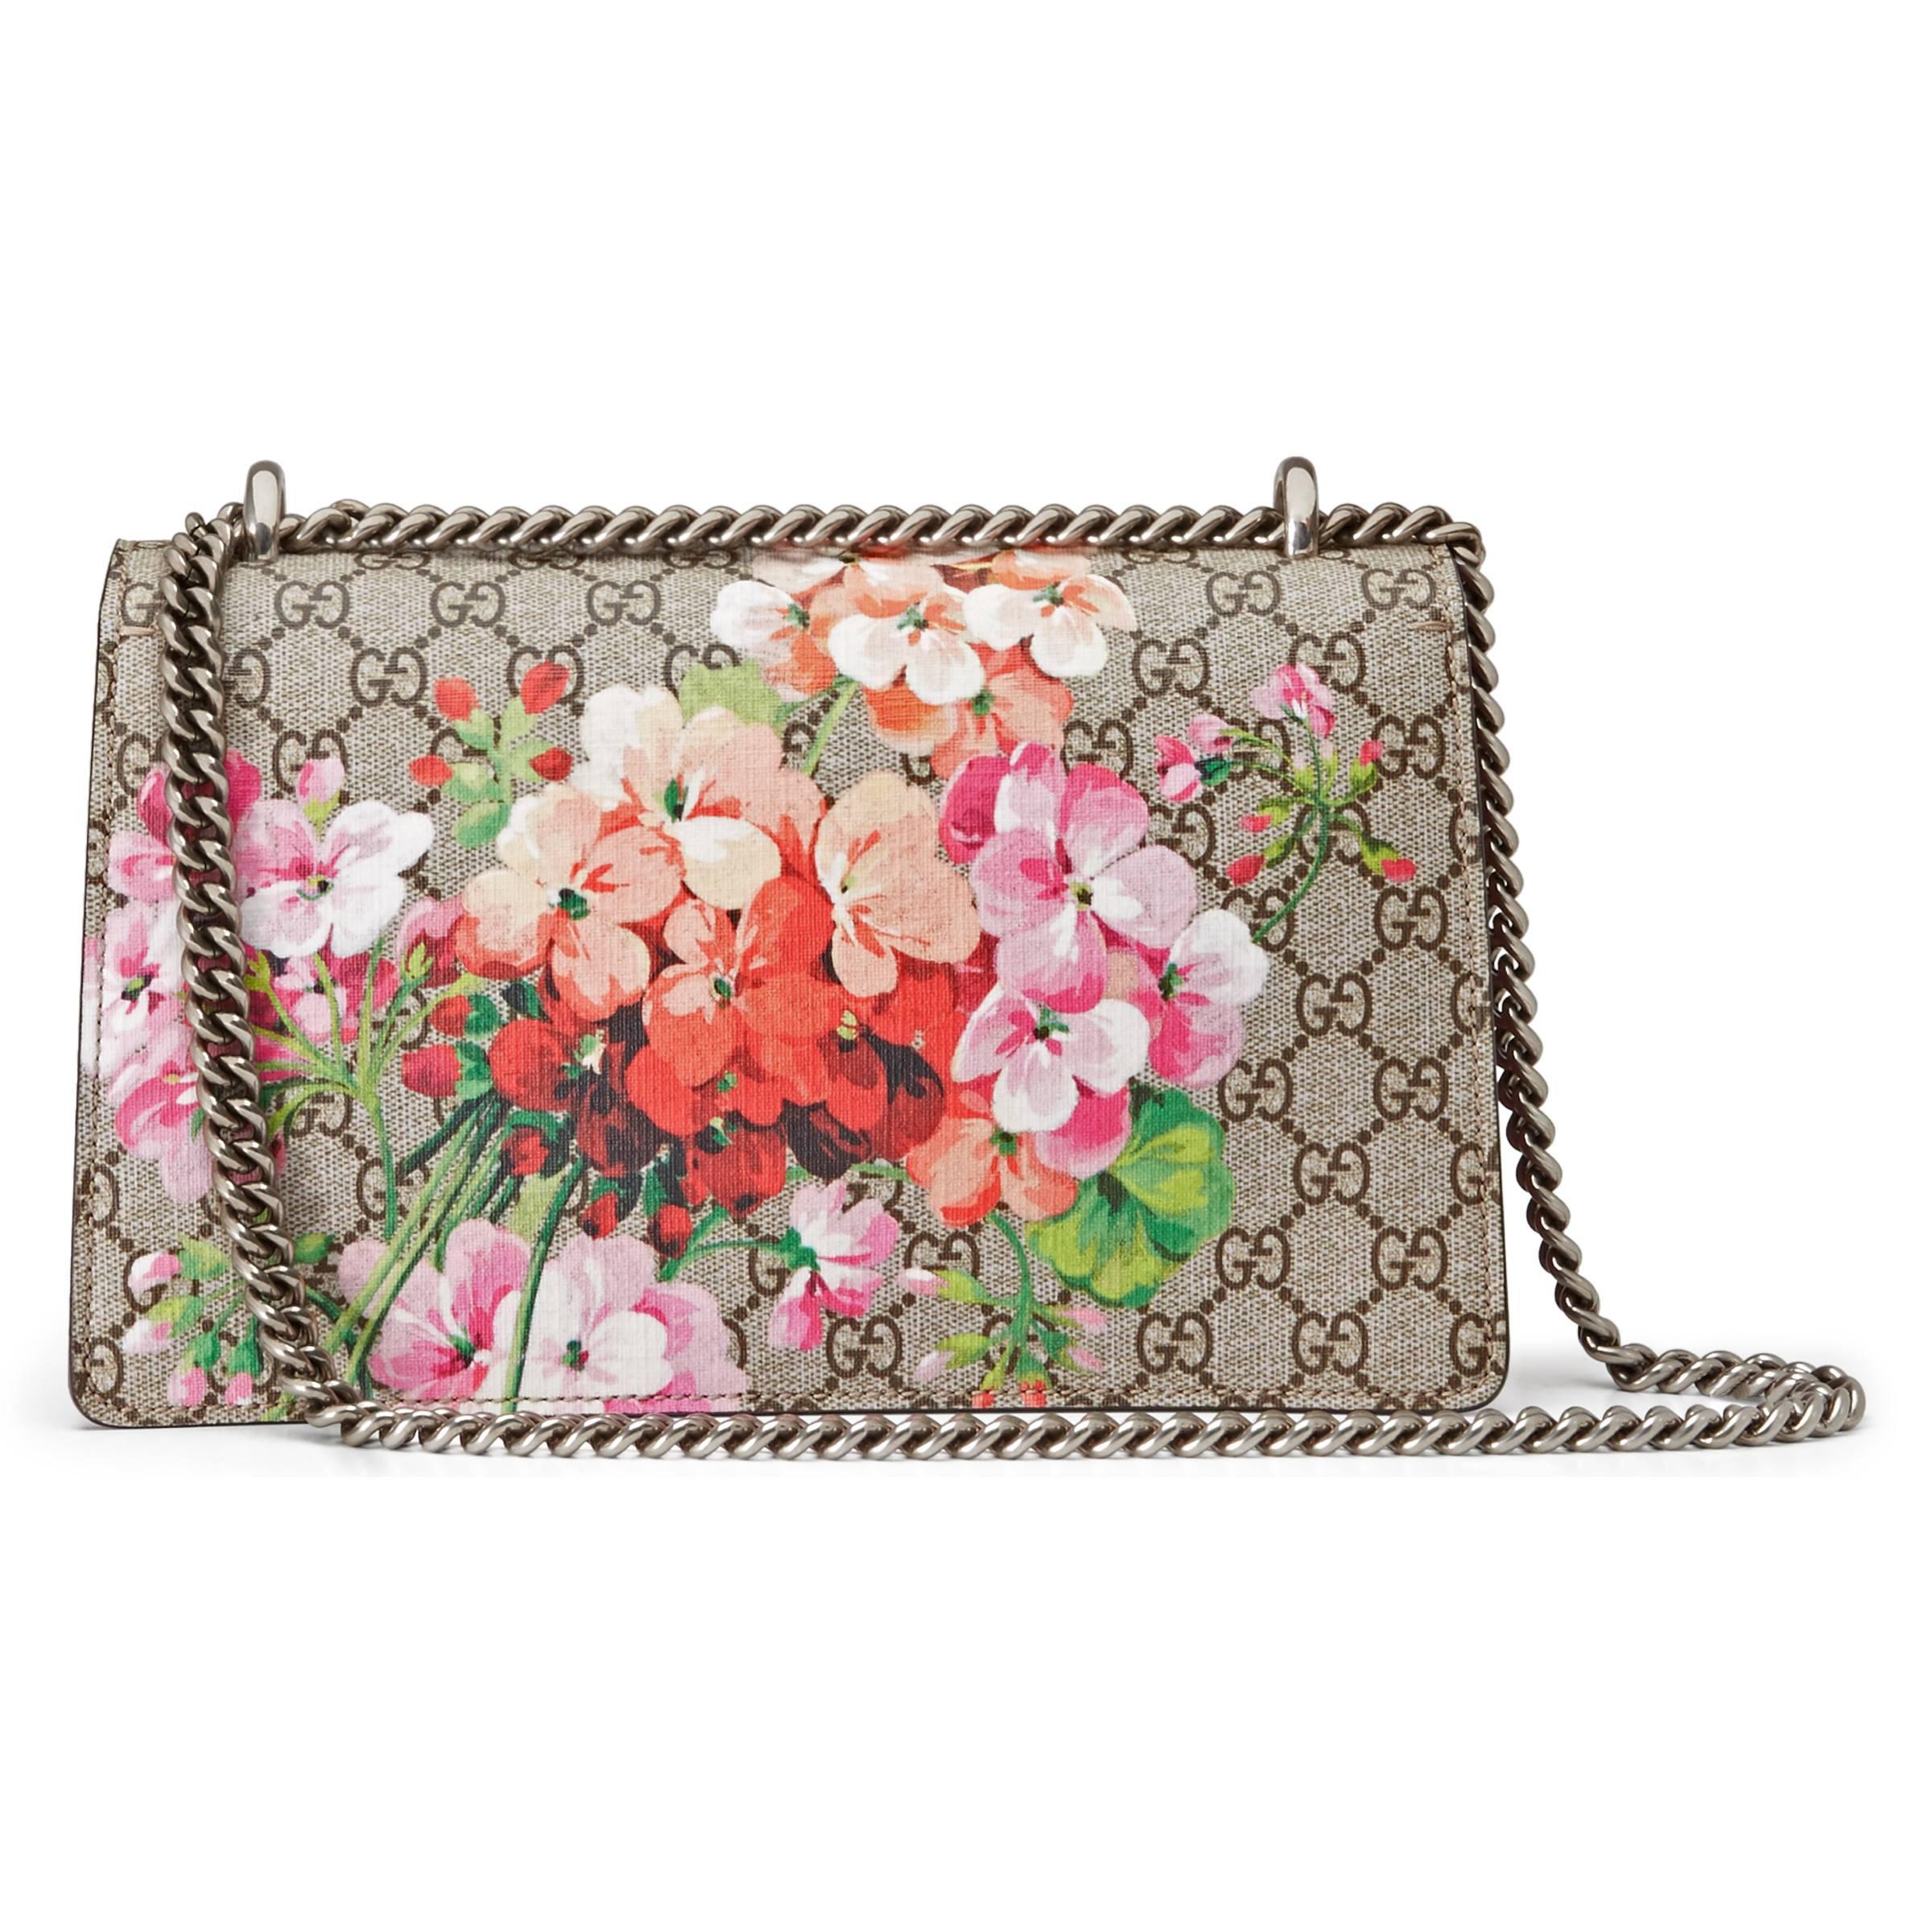 0ae85e0645 Sac à épaule Dionysus petite taille à motif GG Blooms Gucci en ...